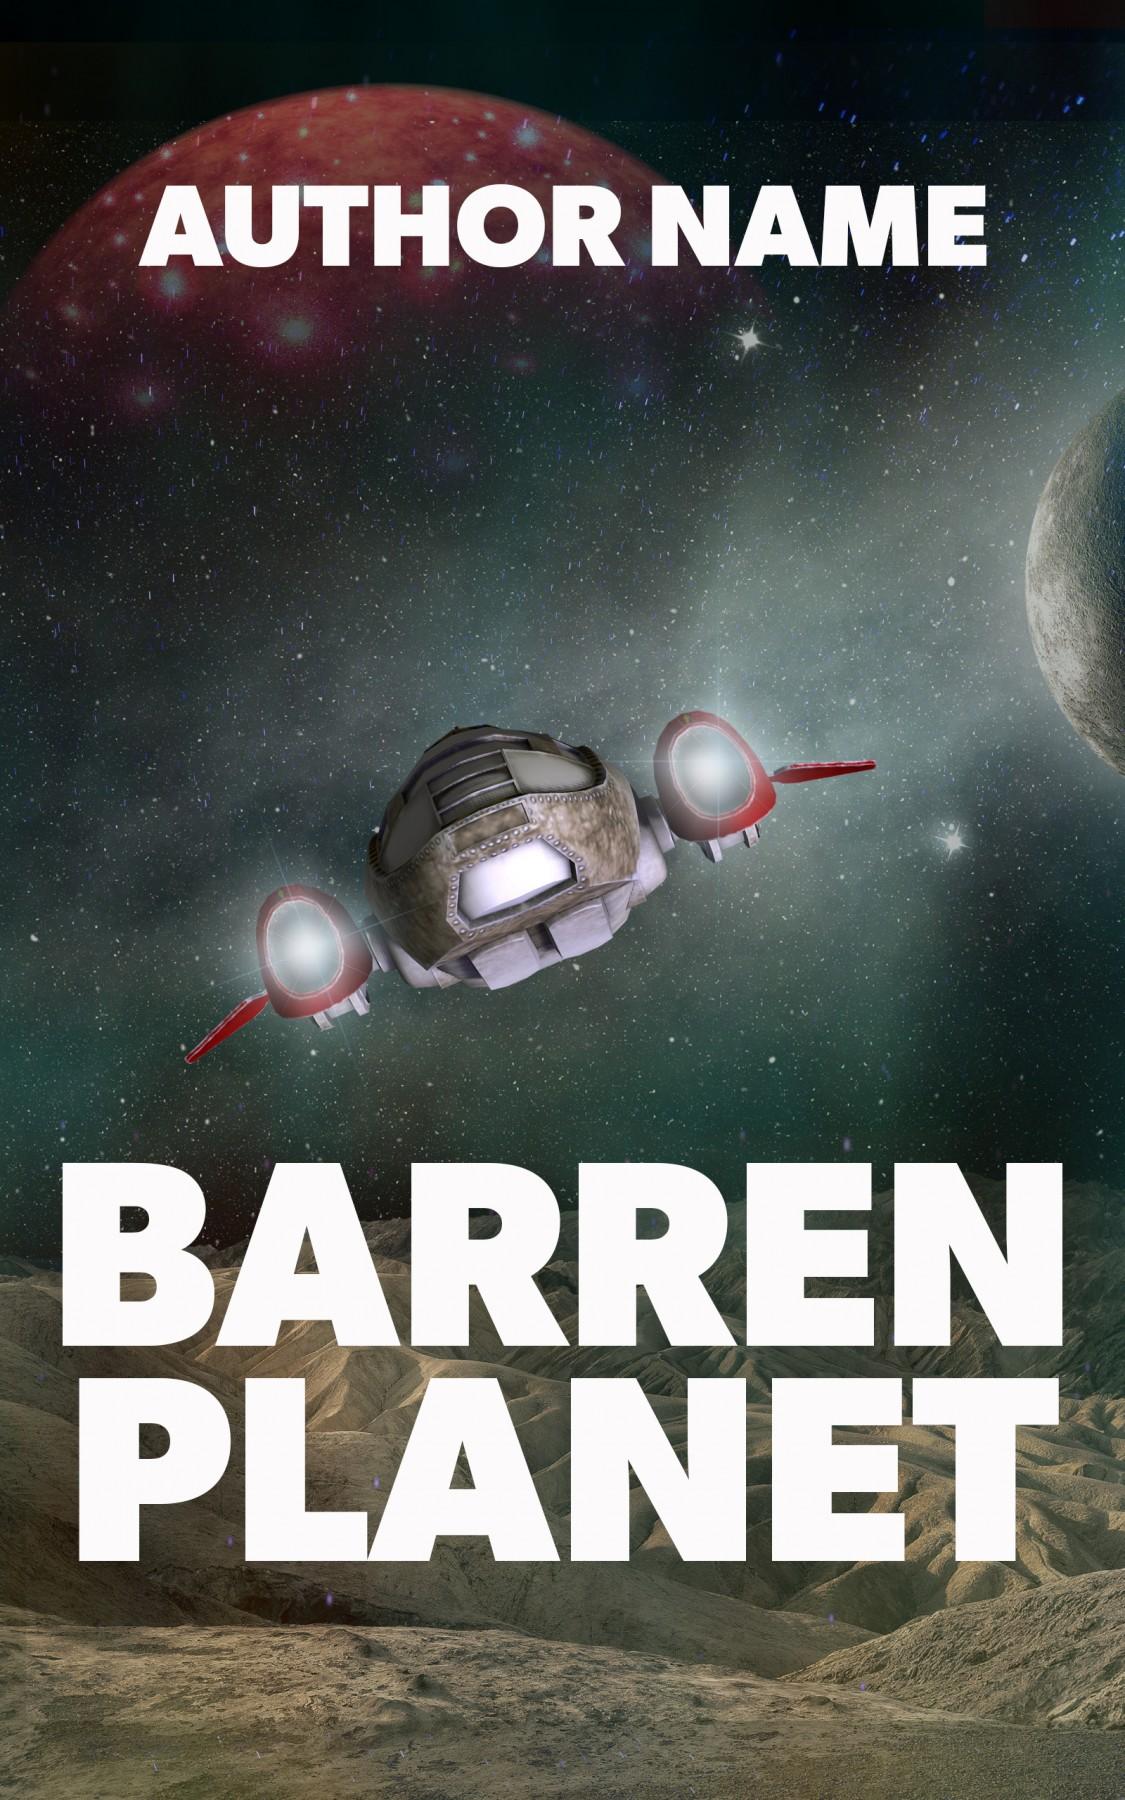 Barren Planet The Book Cover Designer